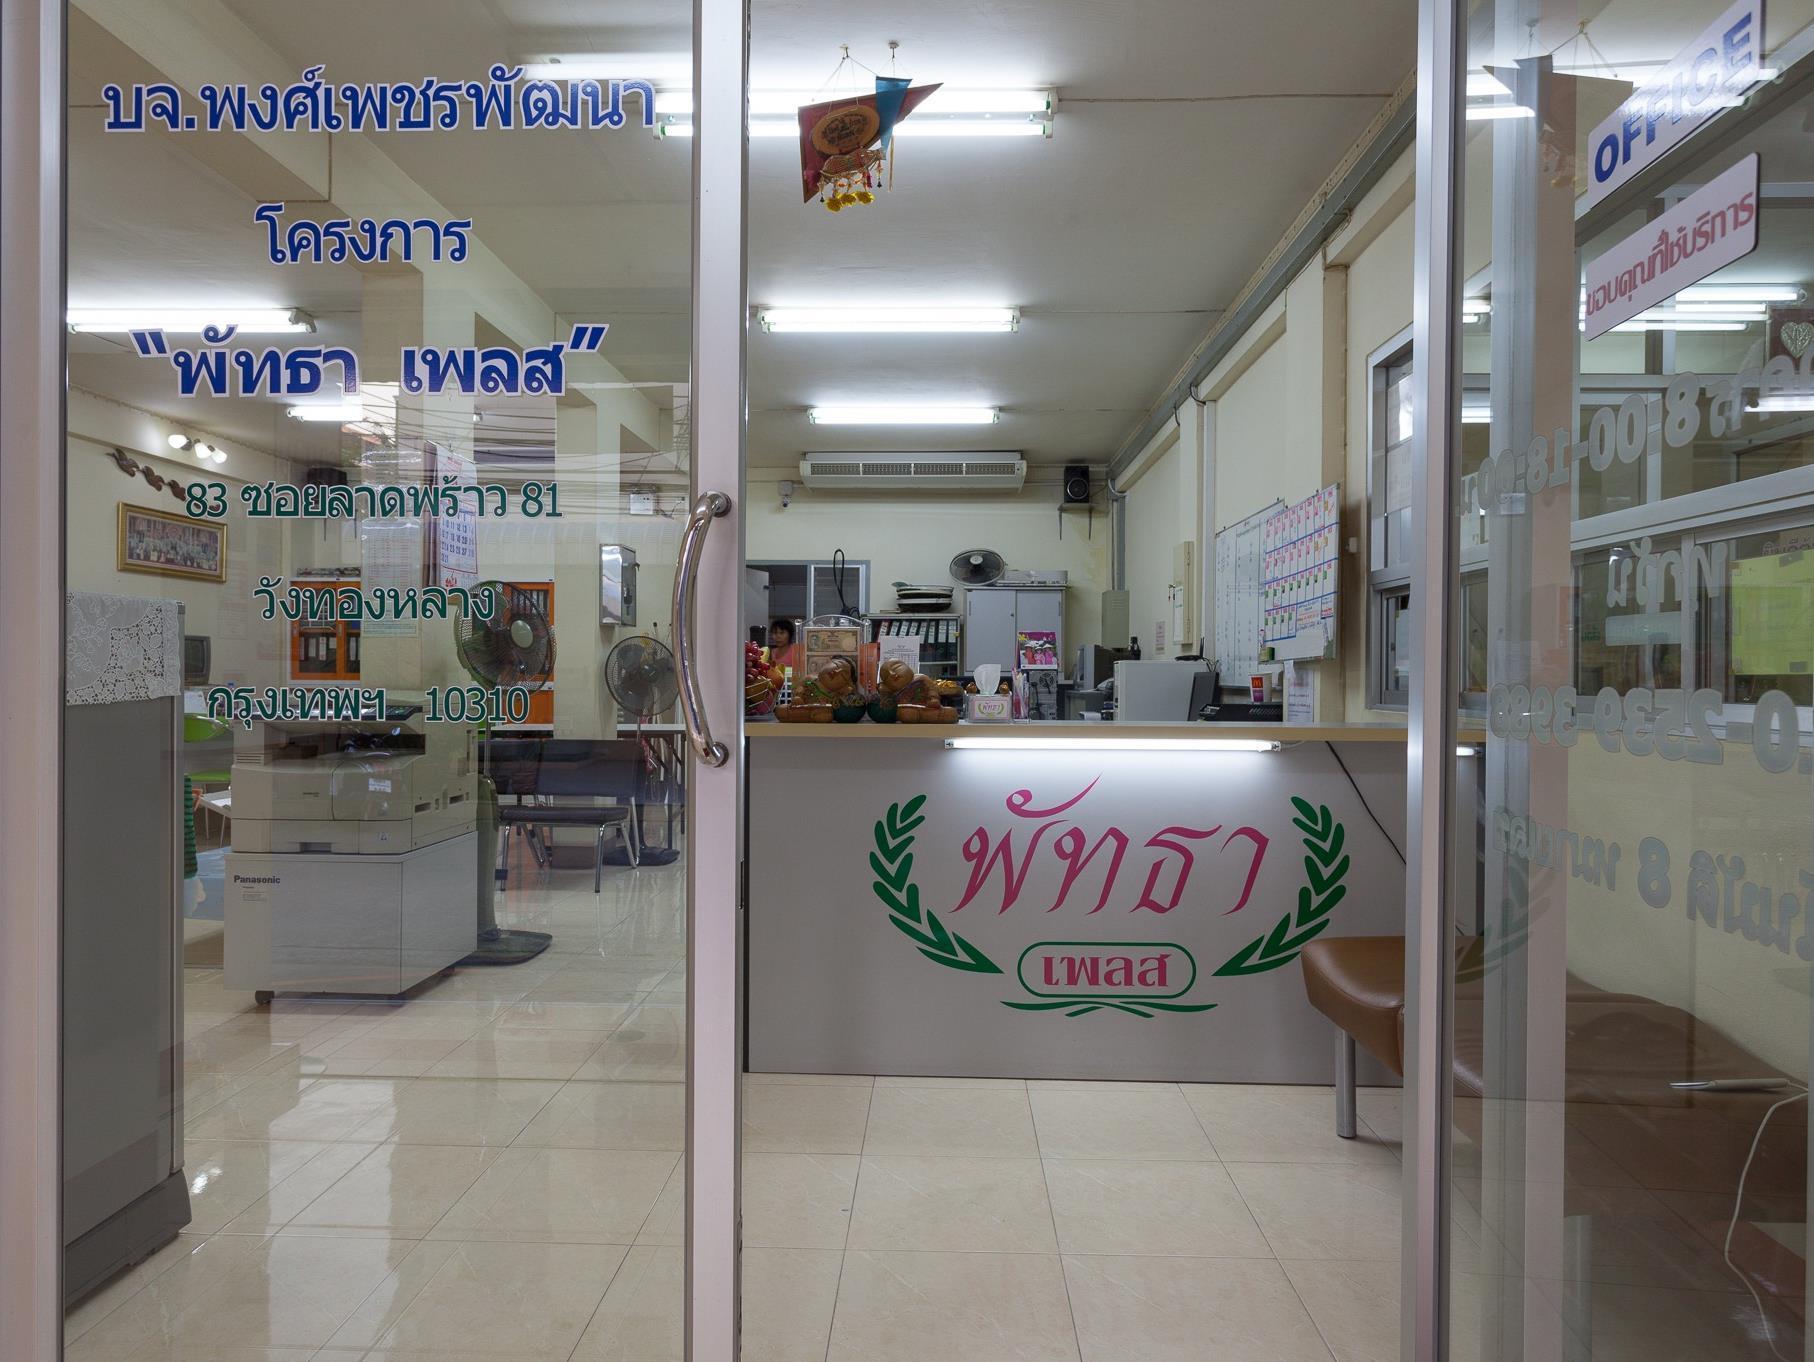 PattaPlace, Wang Thonglang